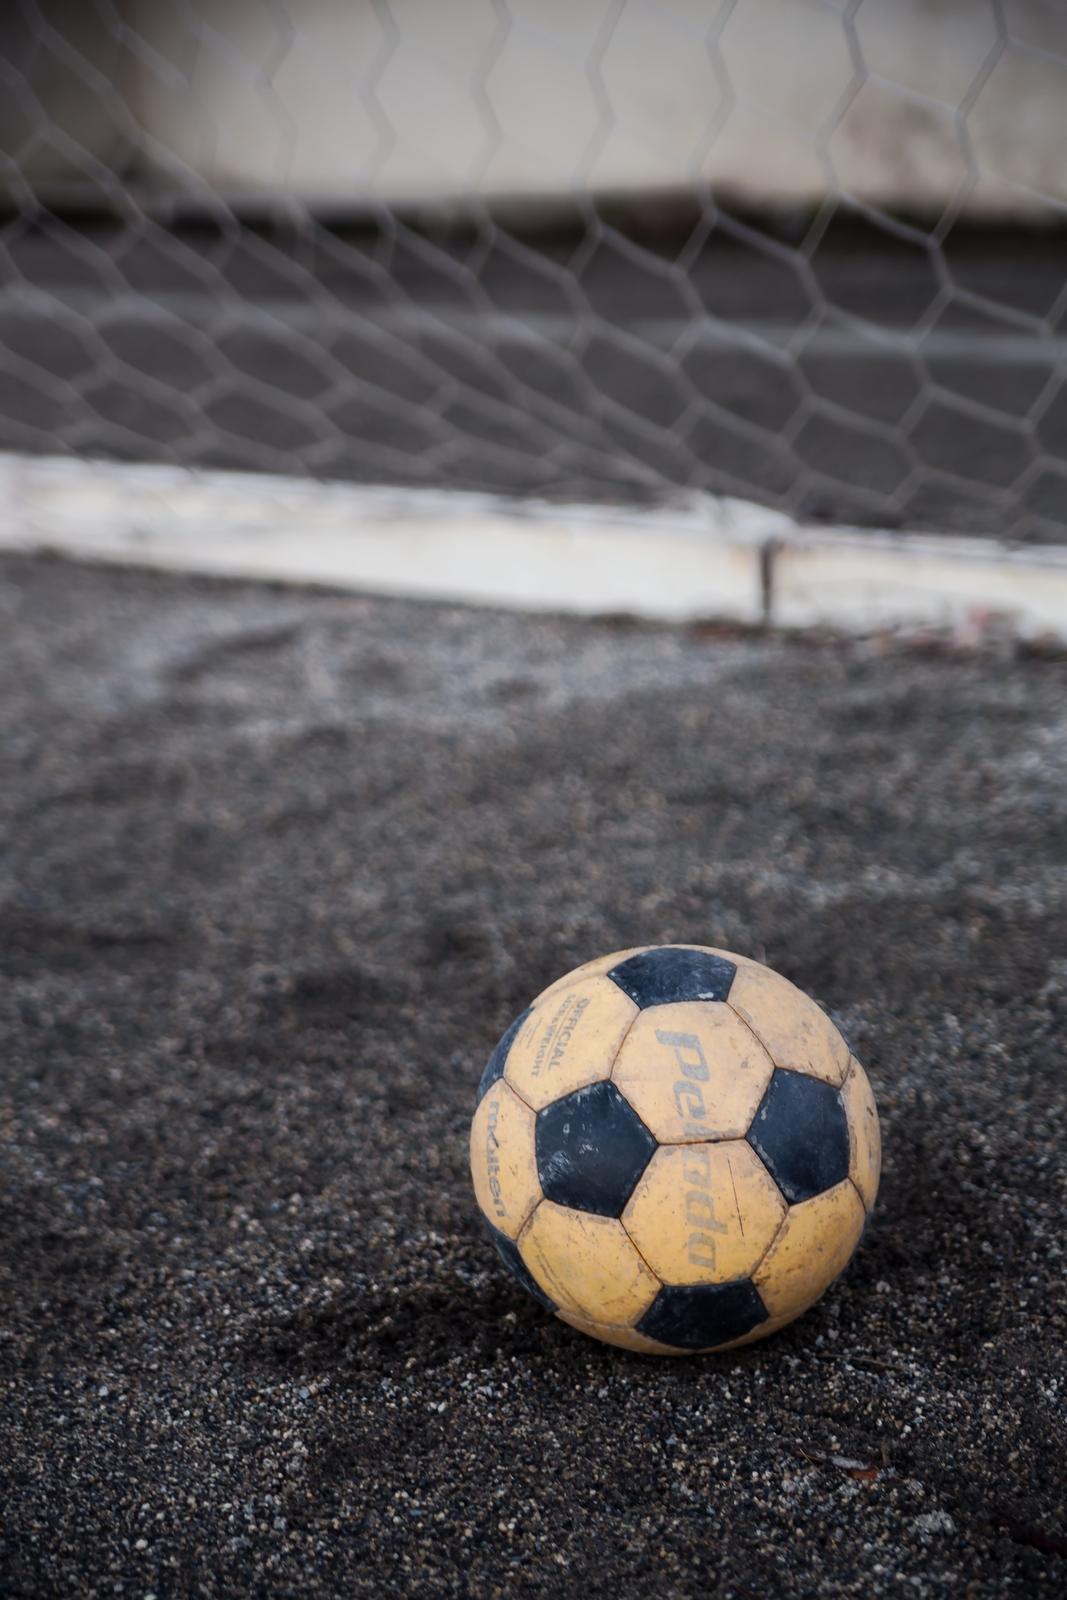 bsPAK82_goalnetsakbol20140102